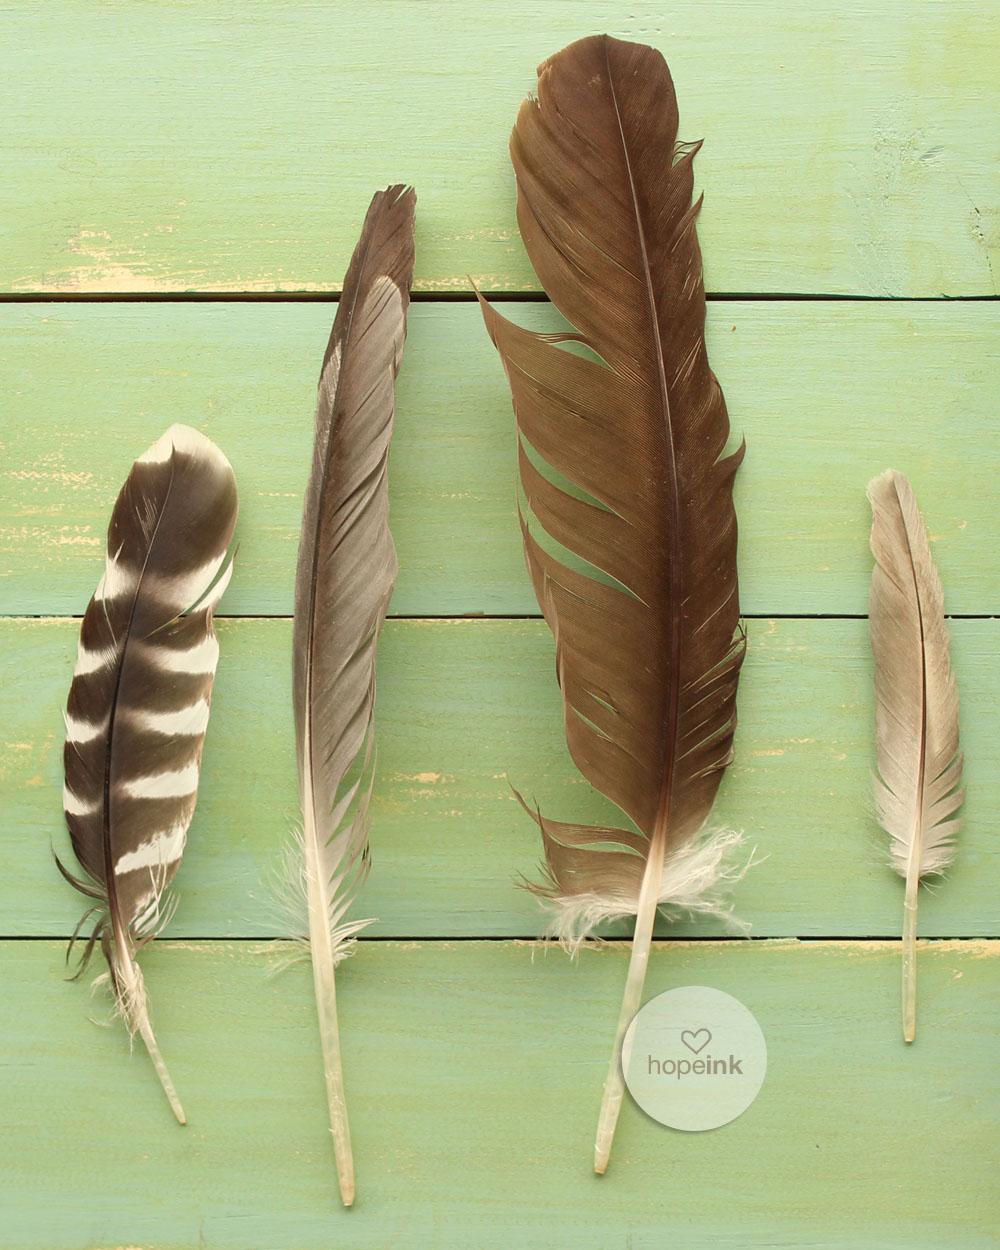 Feathers_wordless_hopeink.jpg